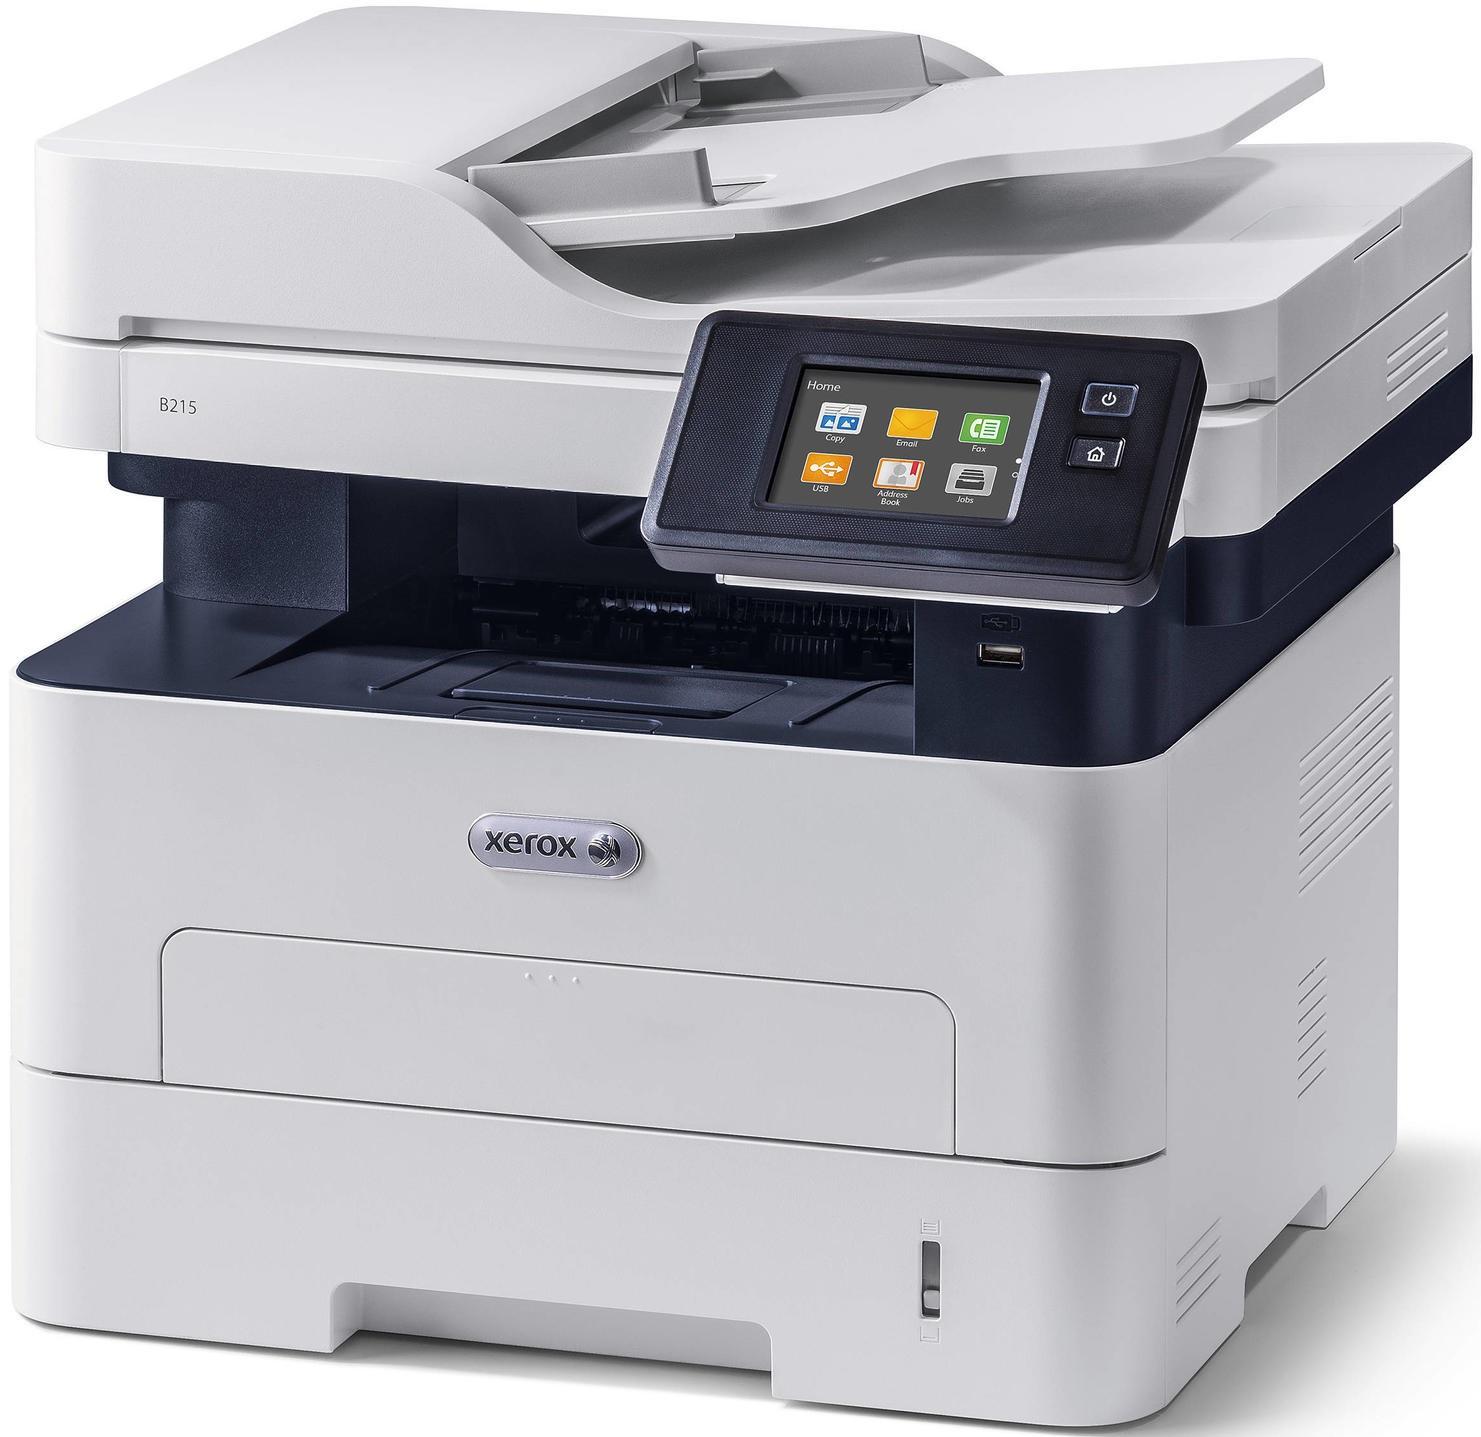 Xerox B215 фикс (fix) прошивка